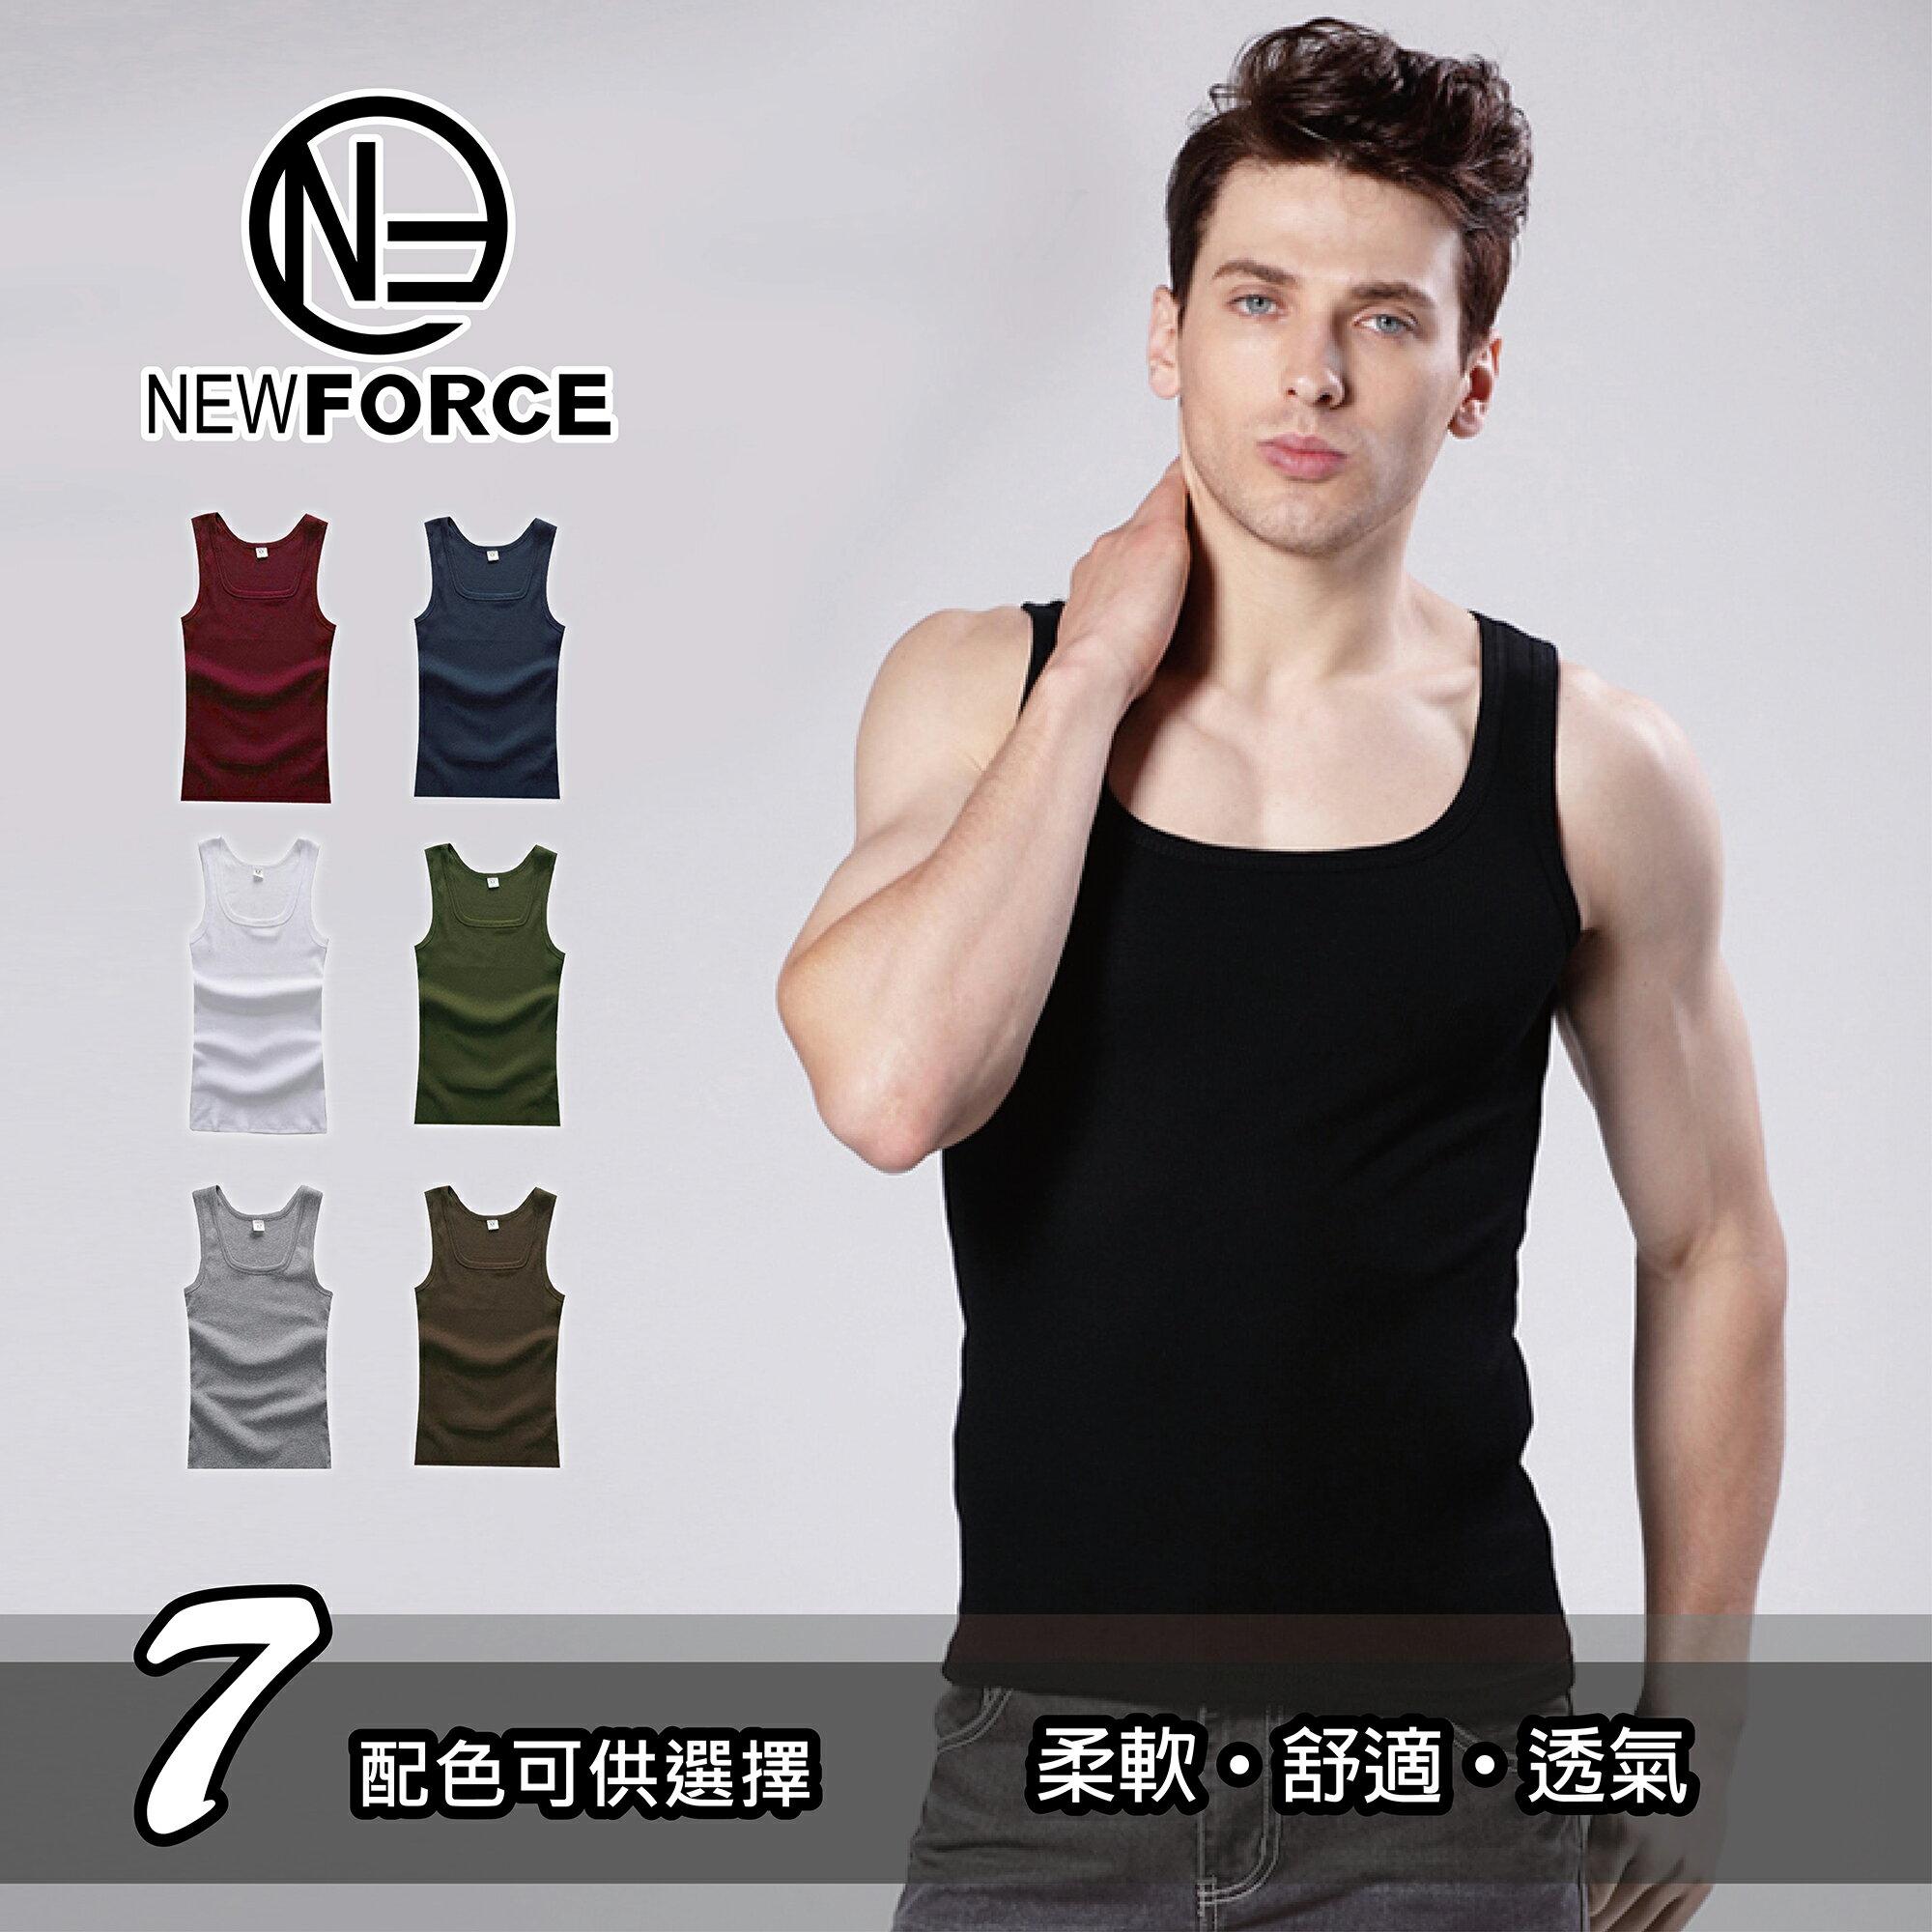 【NEW FORCE】韓版200%彈性修身速乾透氣背心 / 7色可選【2010201】